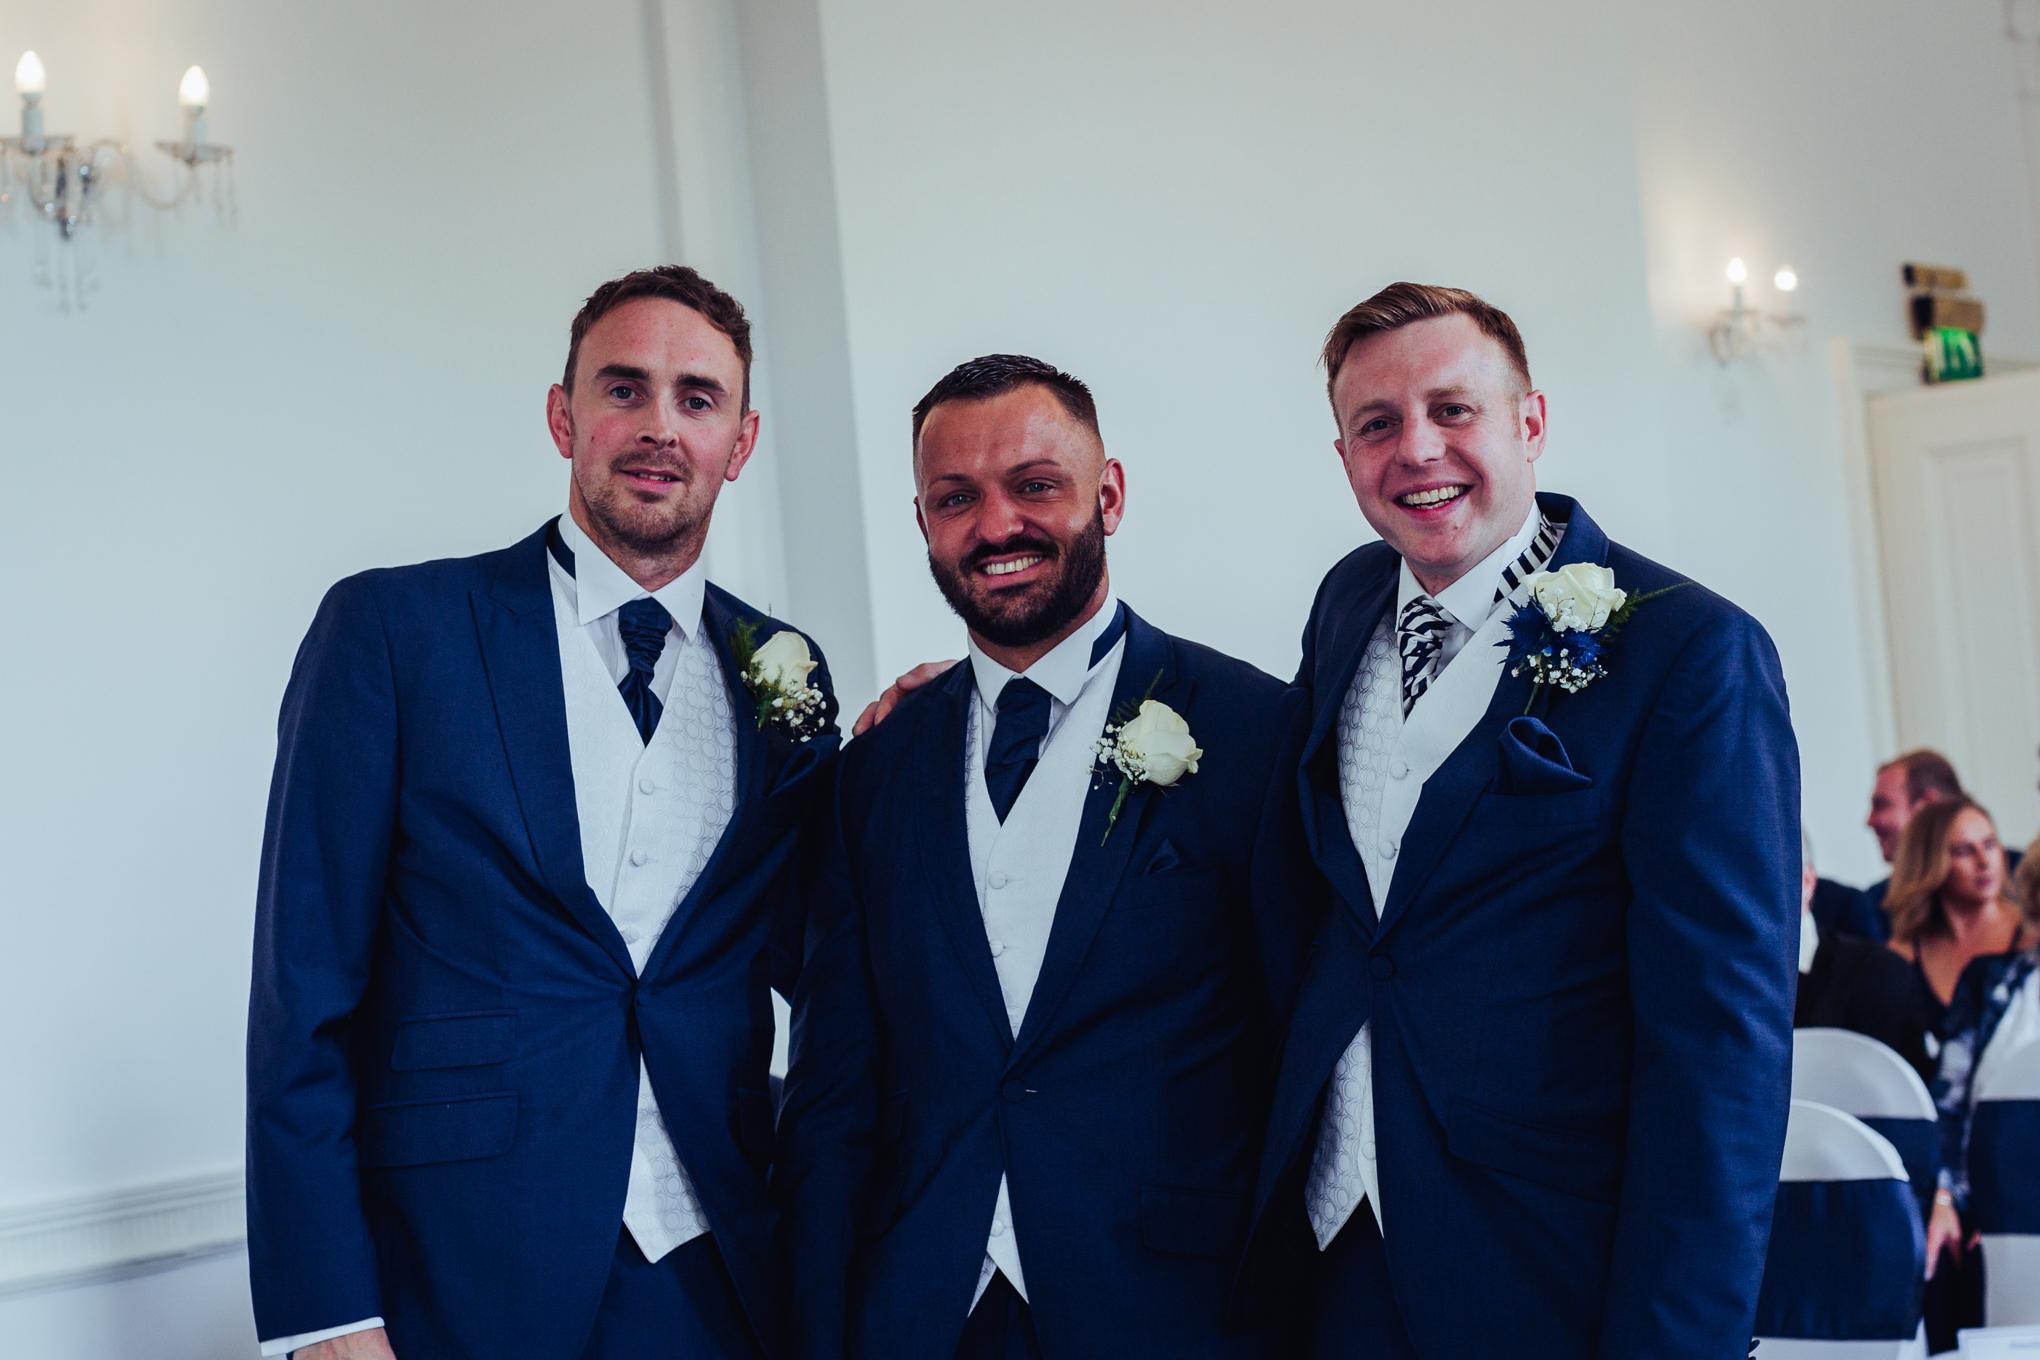 Himley Hall Wedding Photography Photographer groom